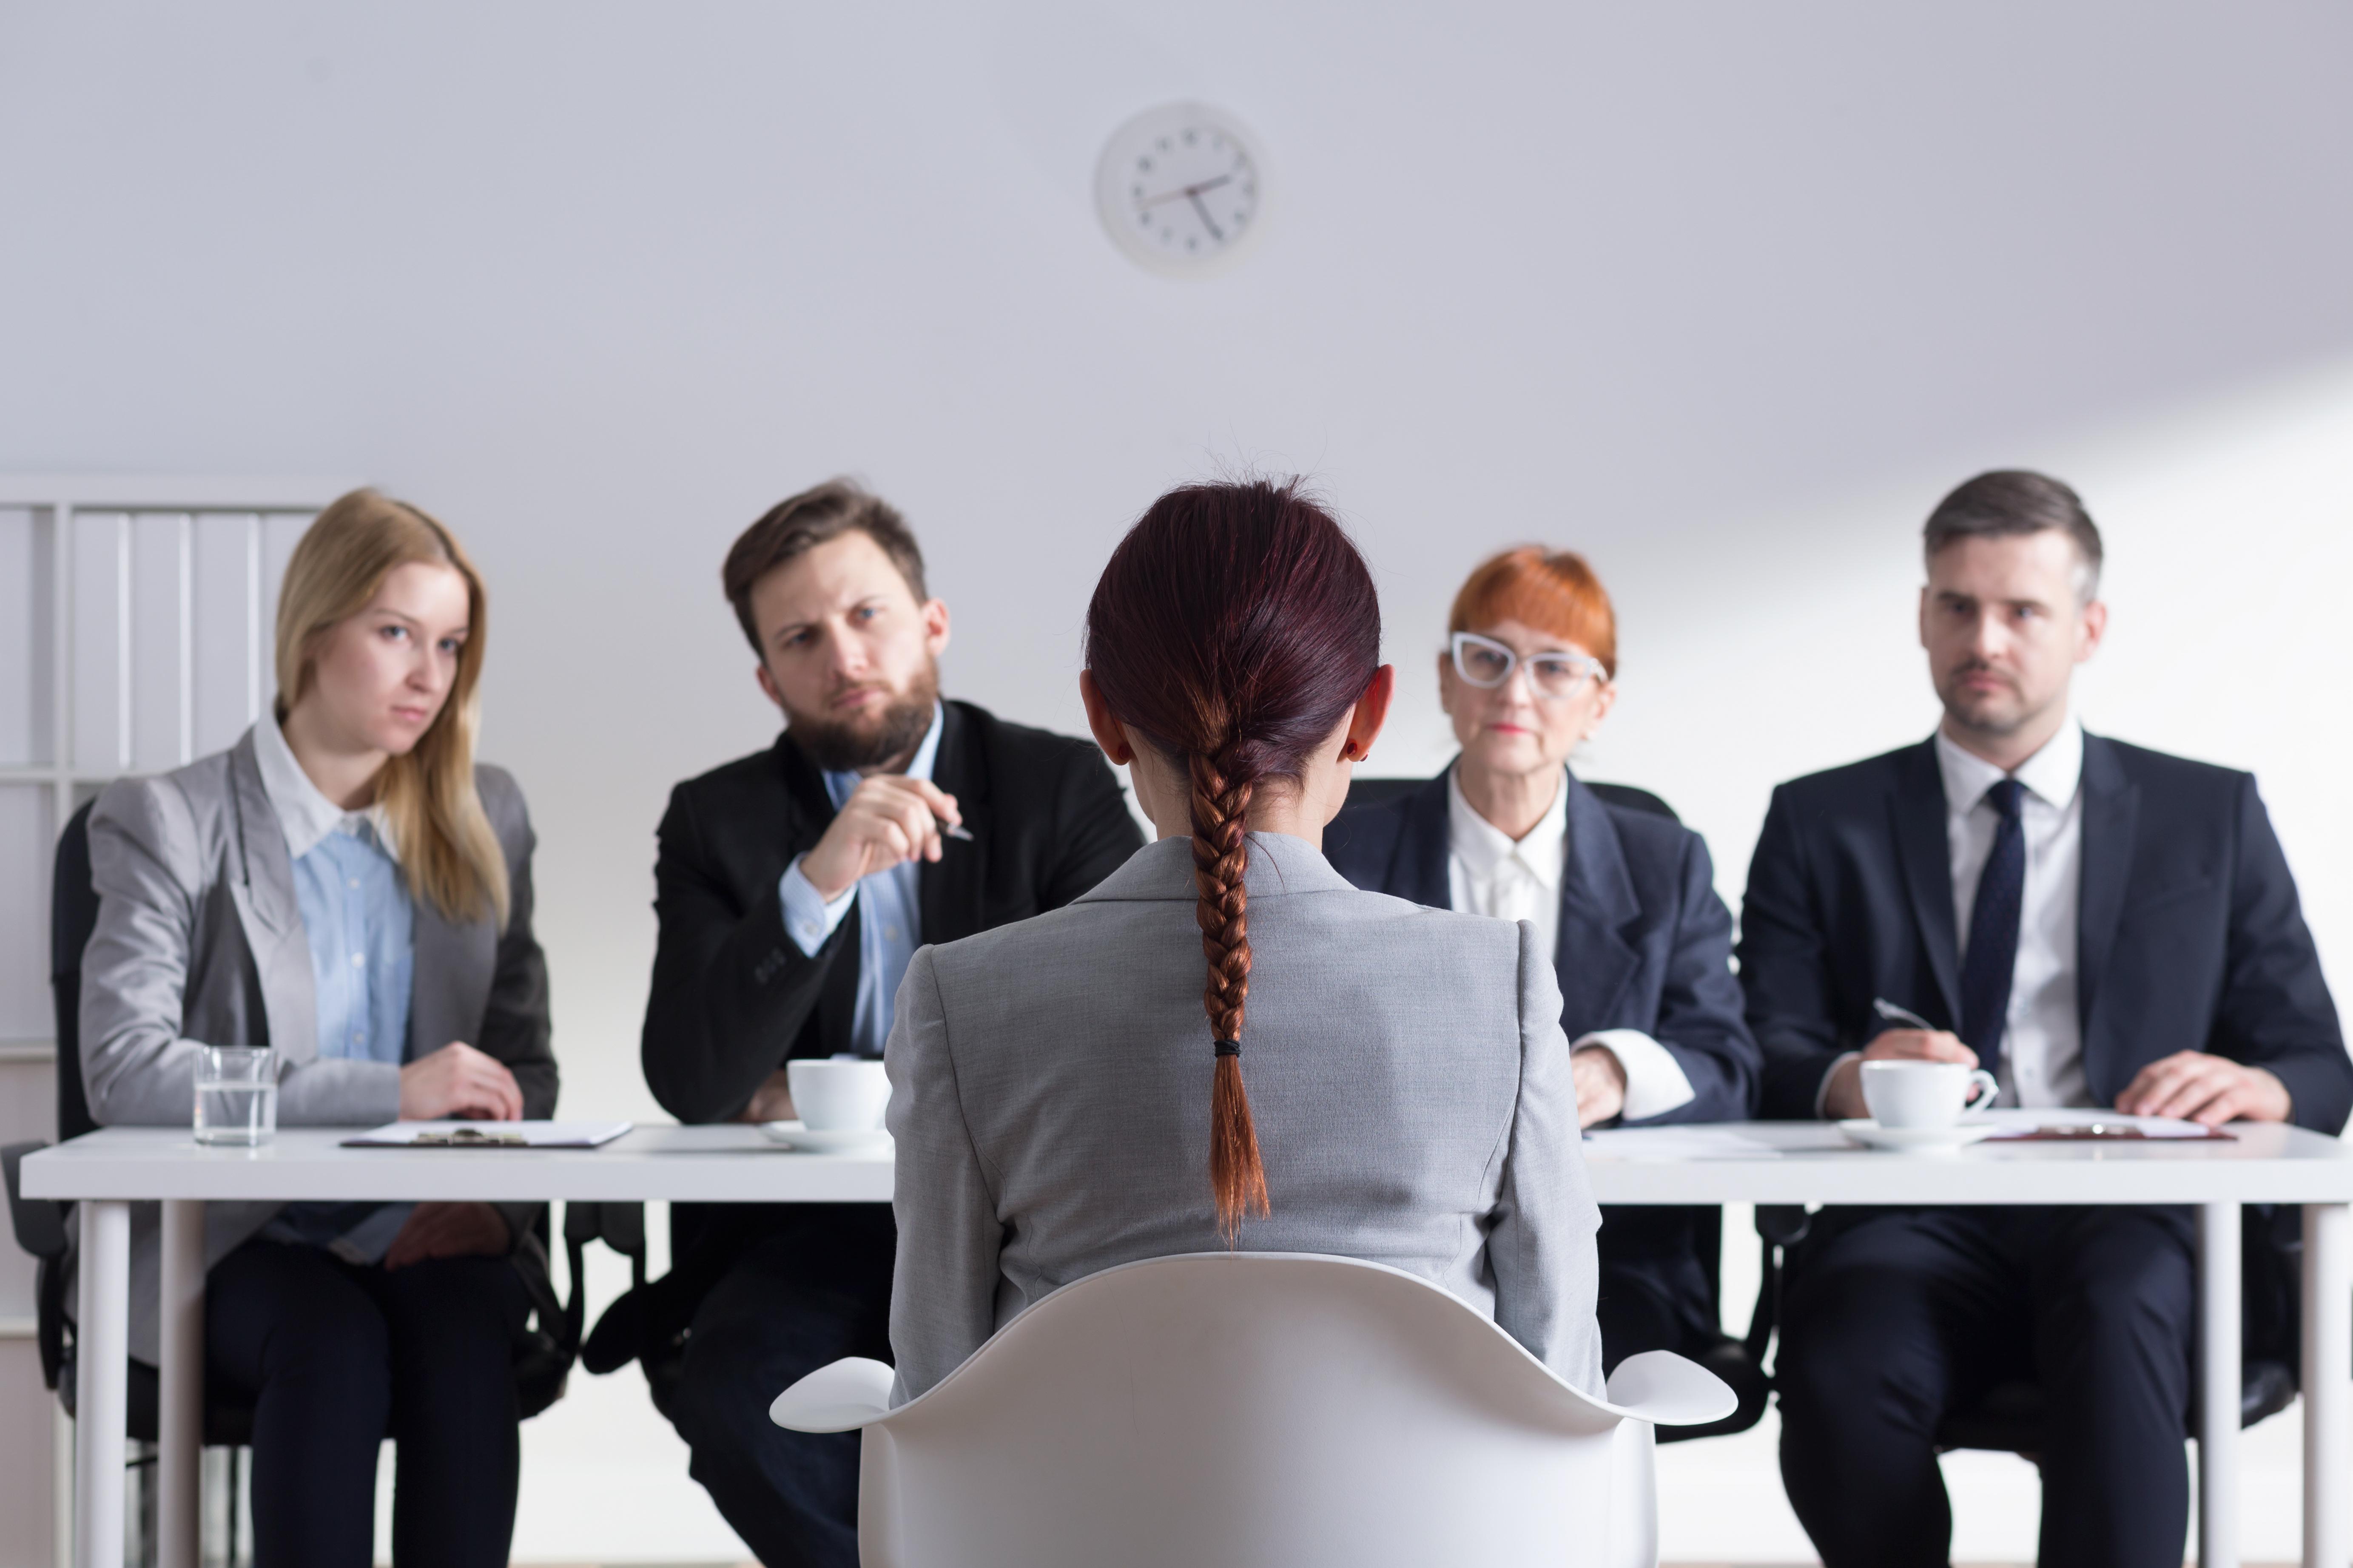 Woman facing hiring committee in job interview